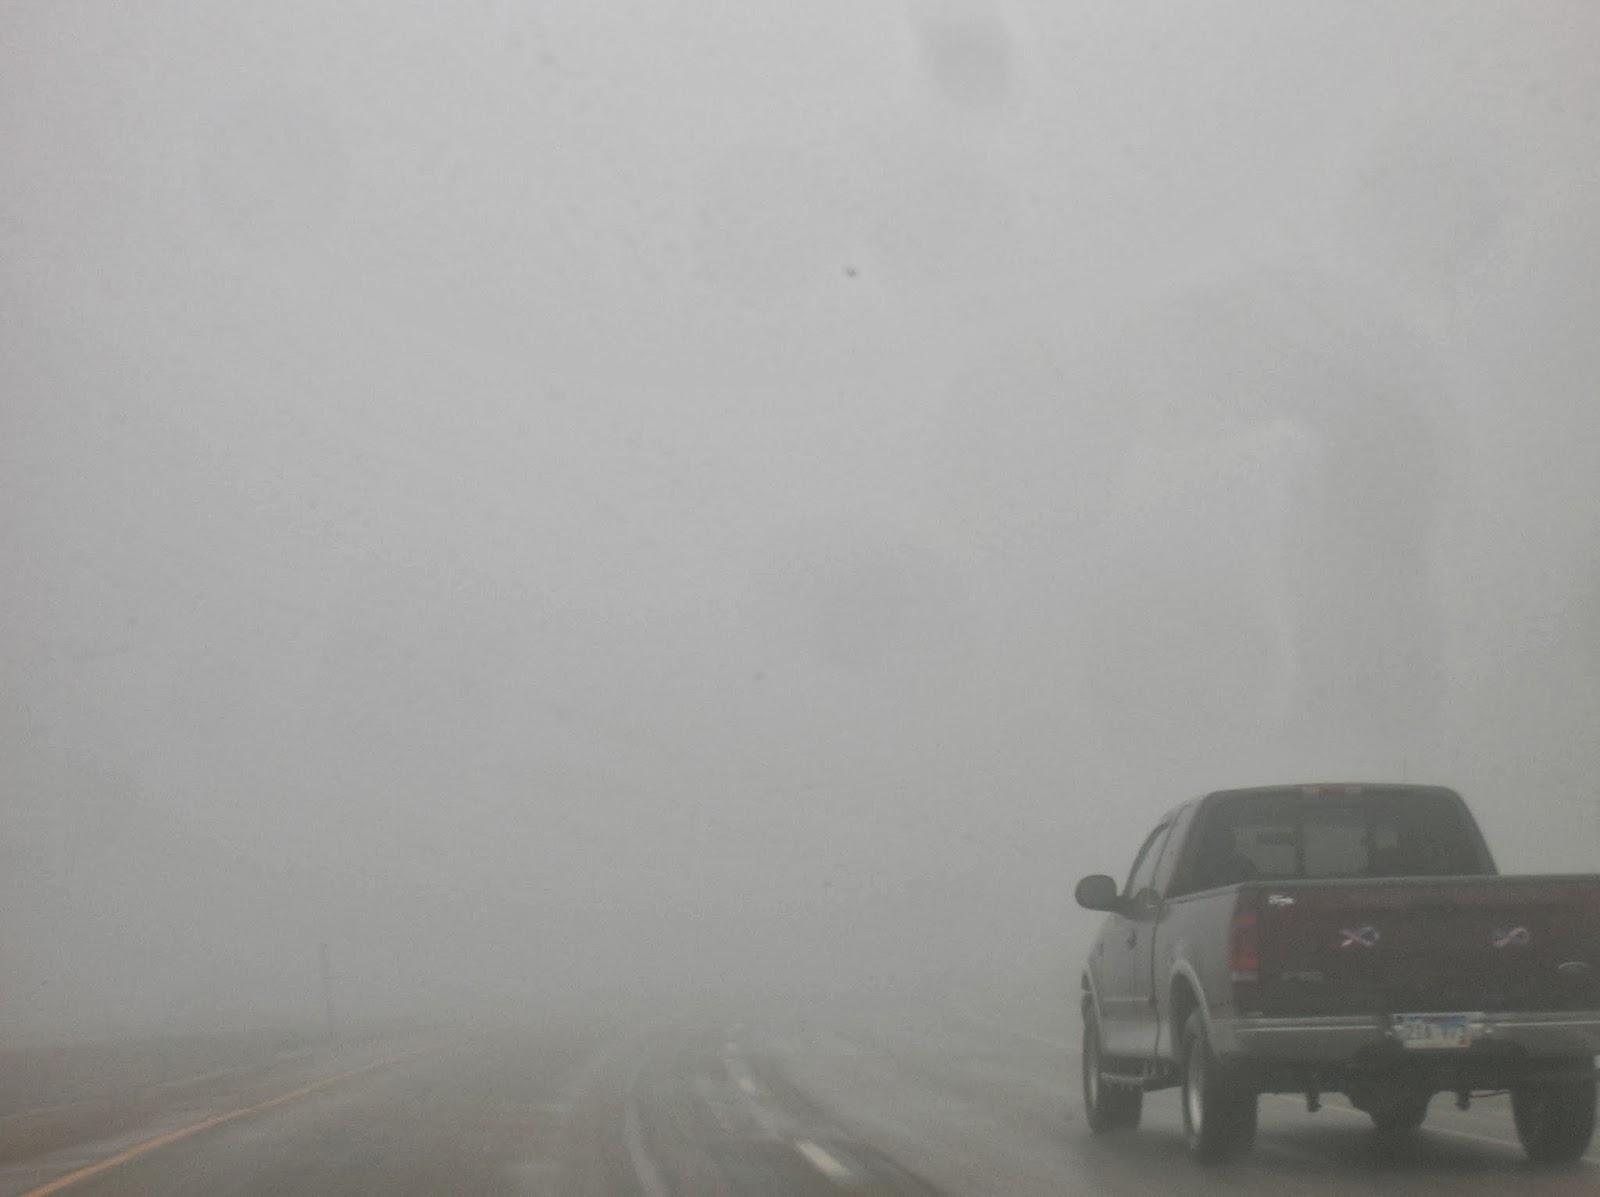 Truck lost in the fog in south dakota